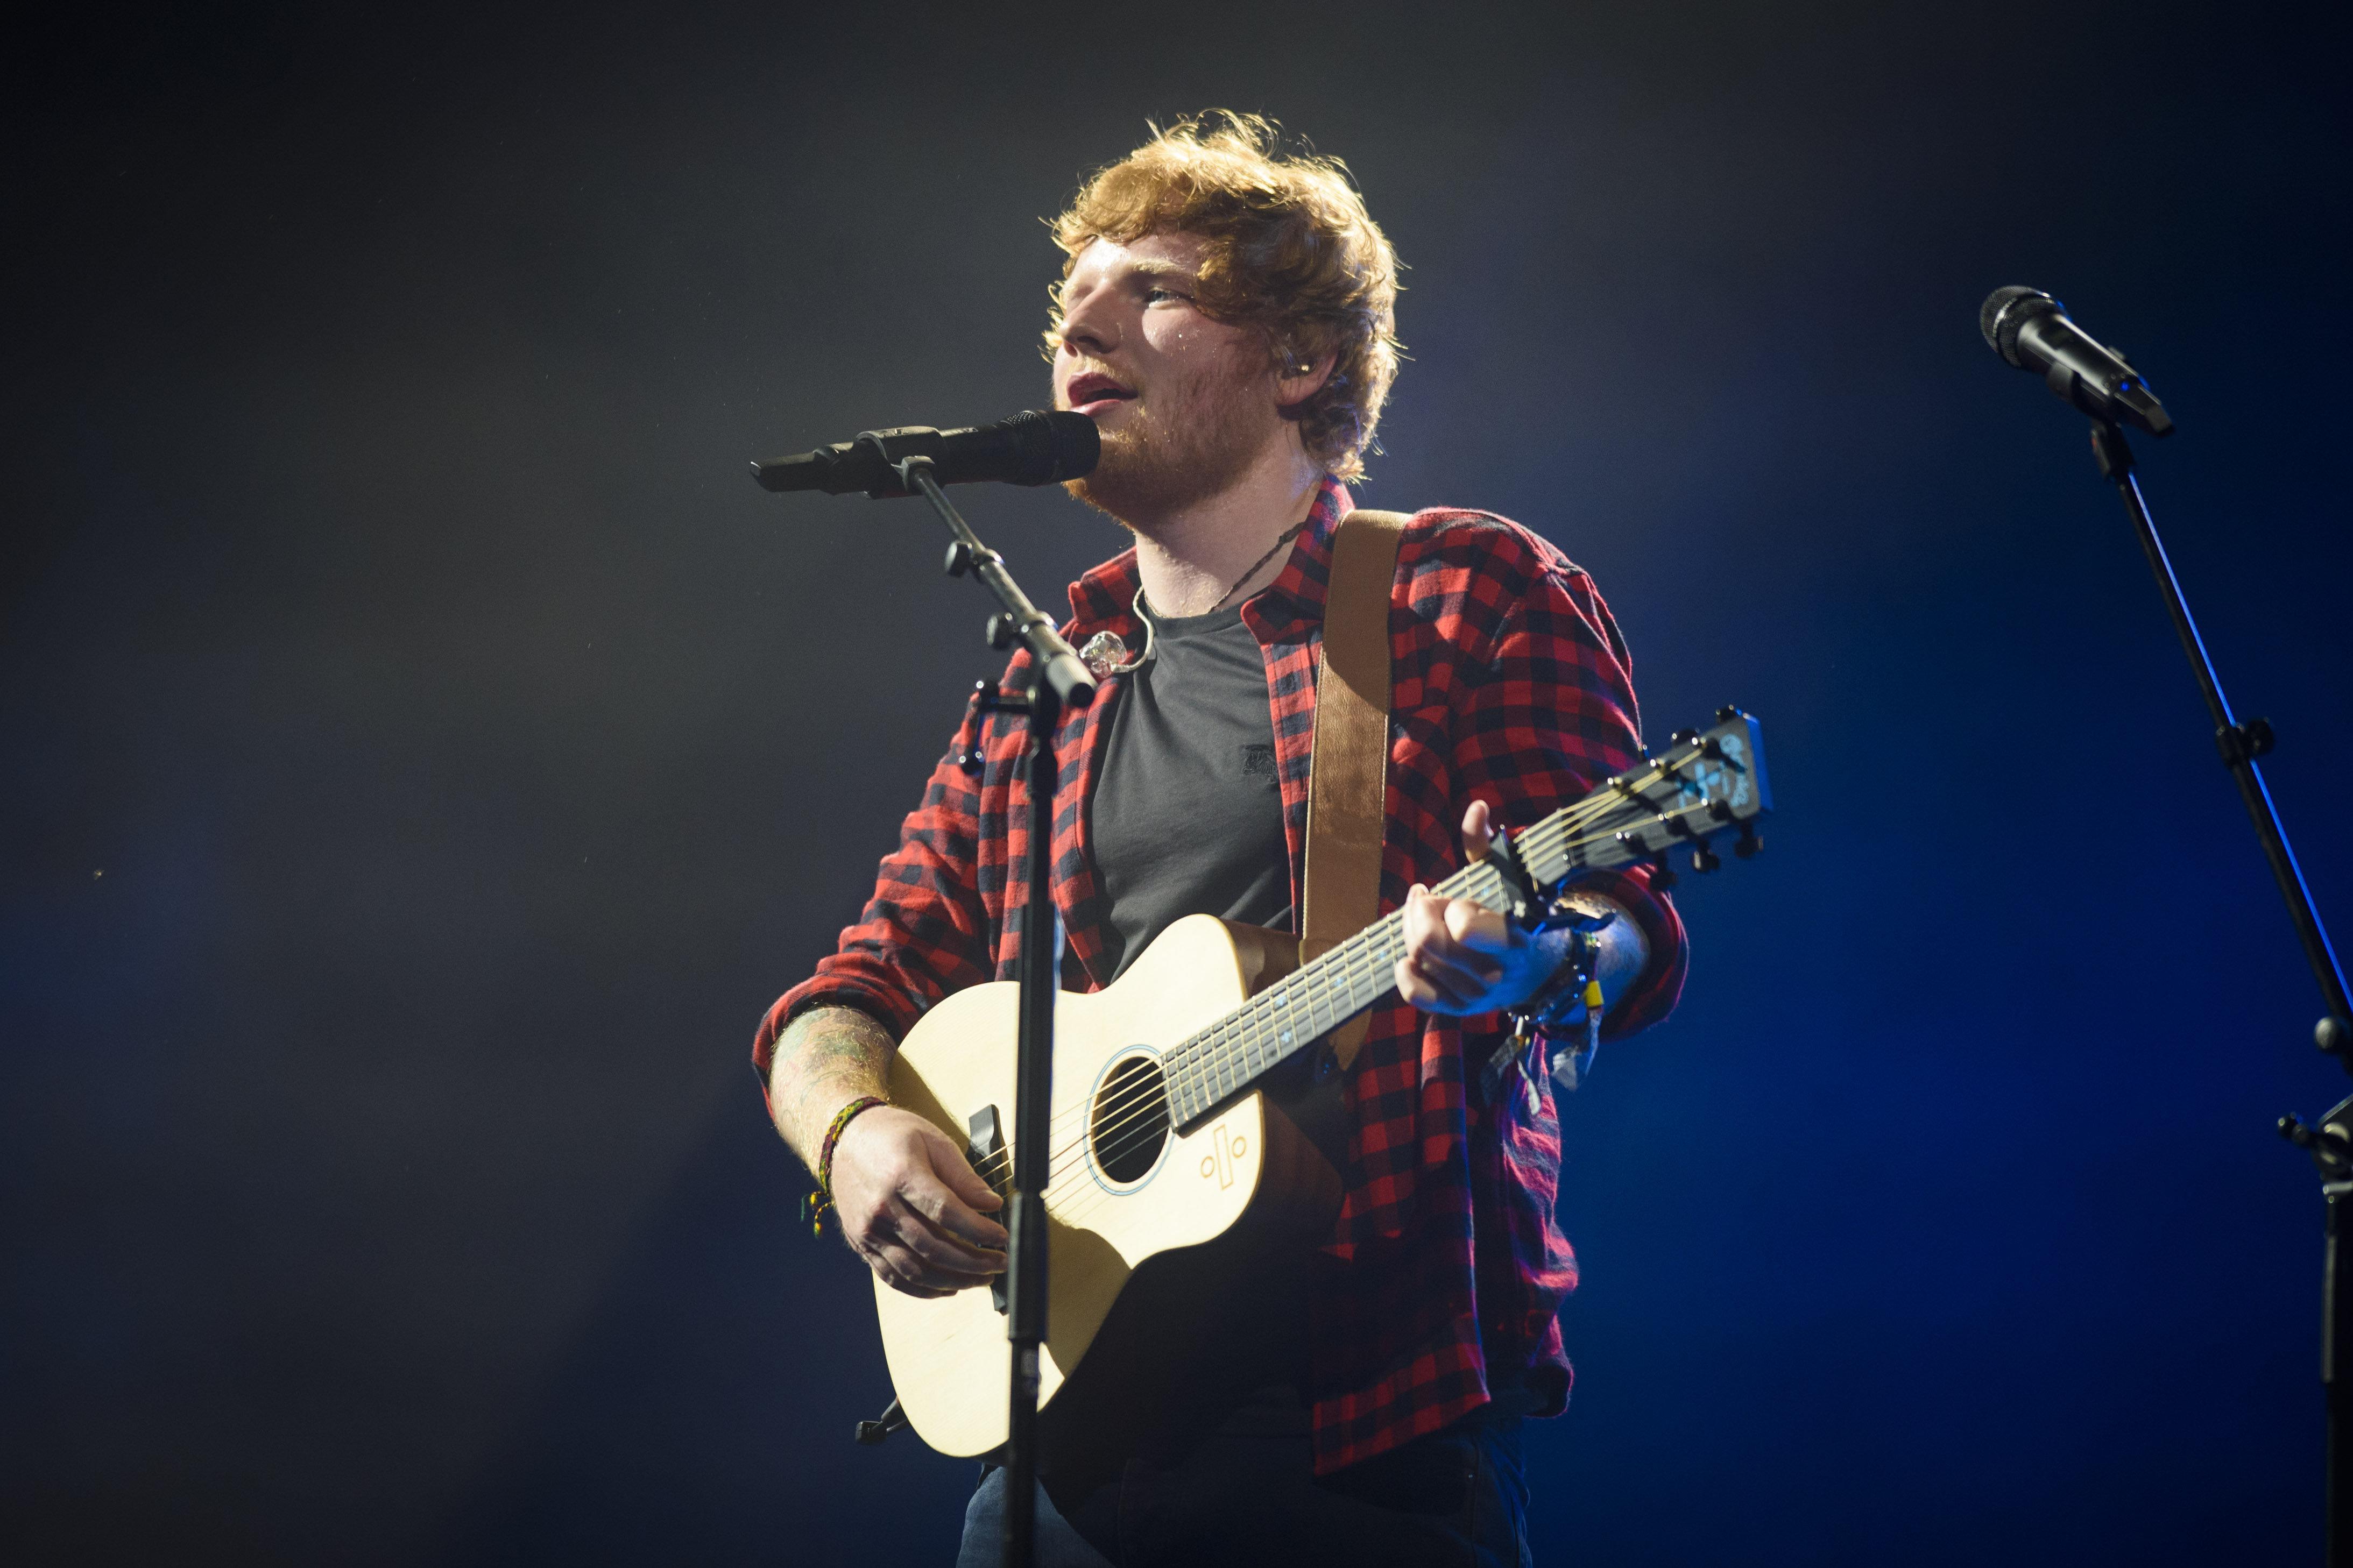 Ed Sheeran Hits Back At False Accusations About His Glastonbury Headline